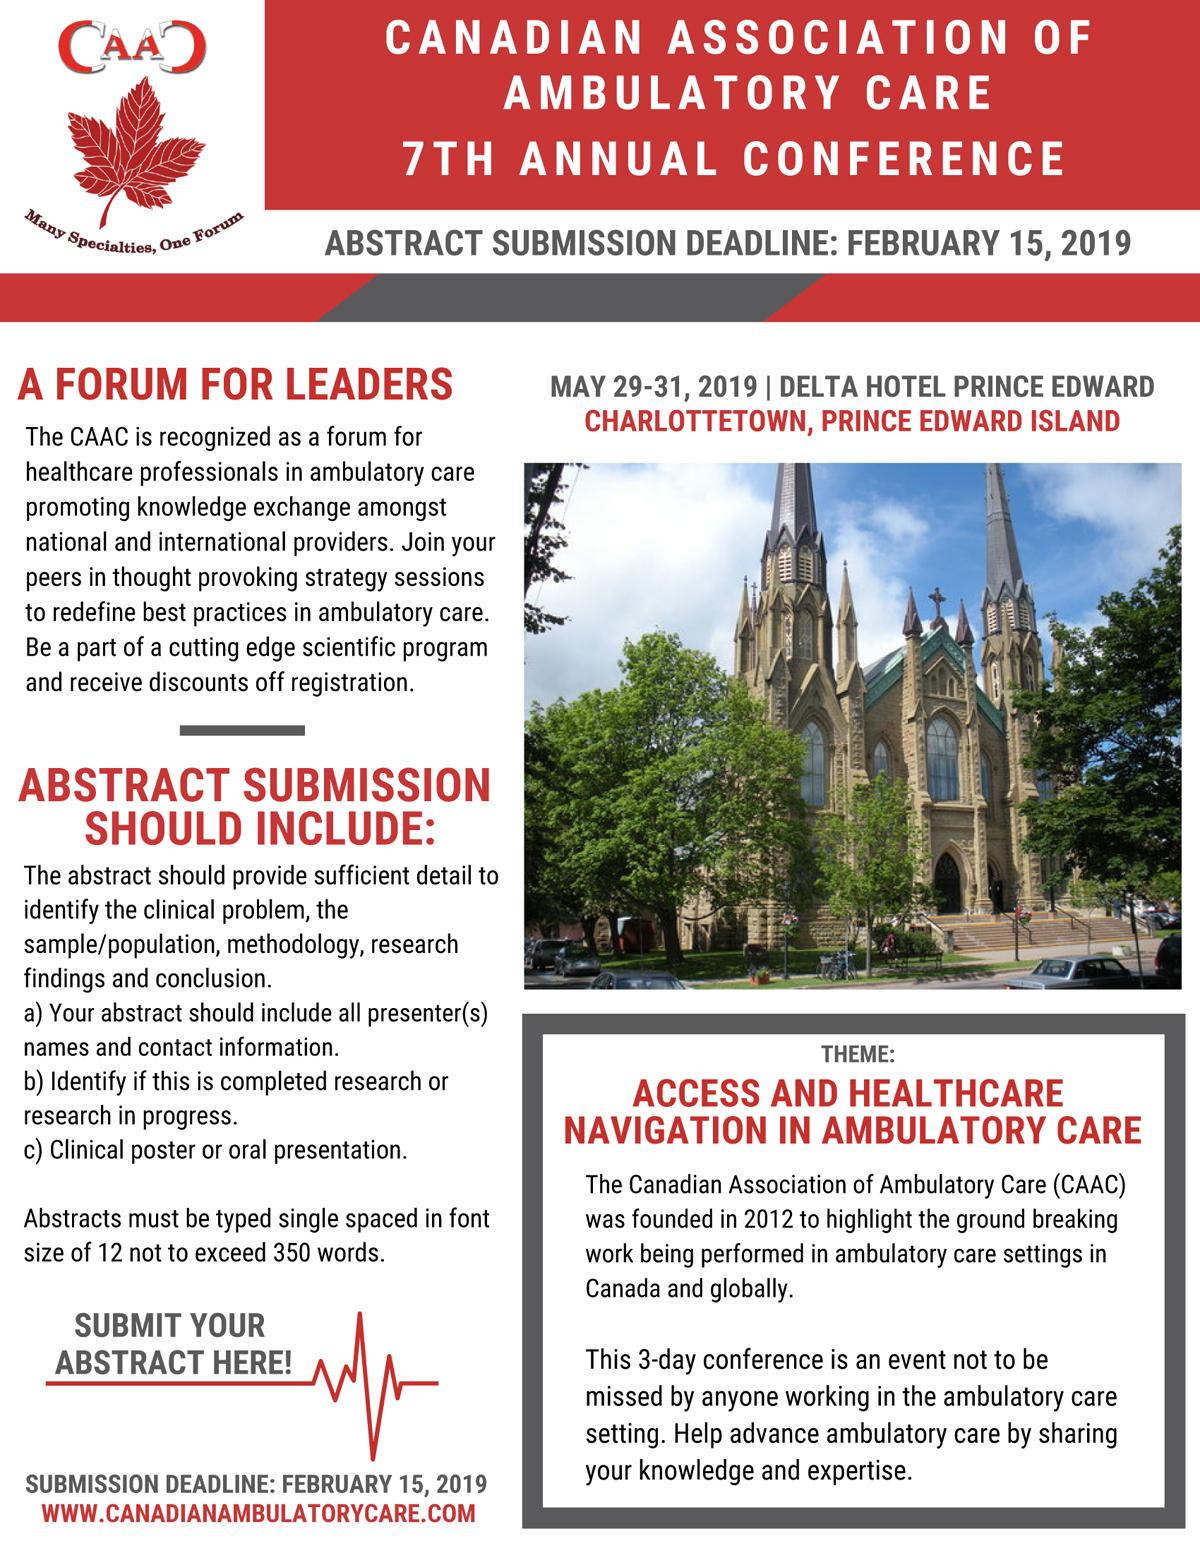 Canadian Association of Ambulatory Care